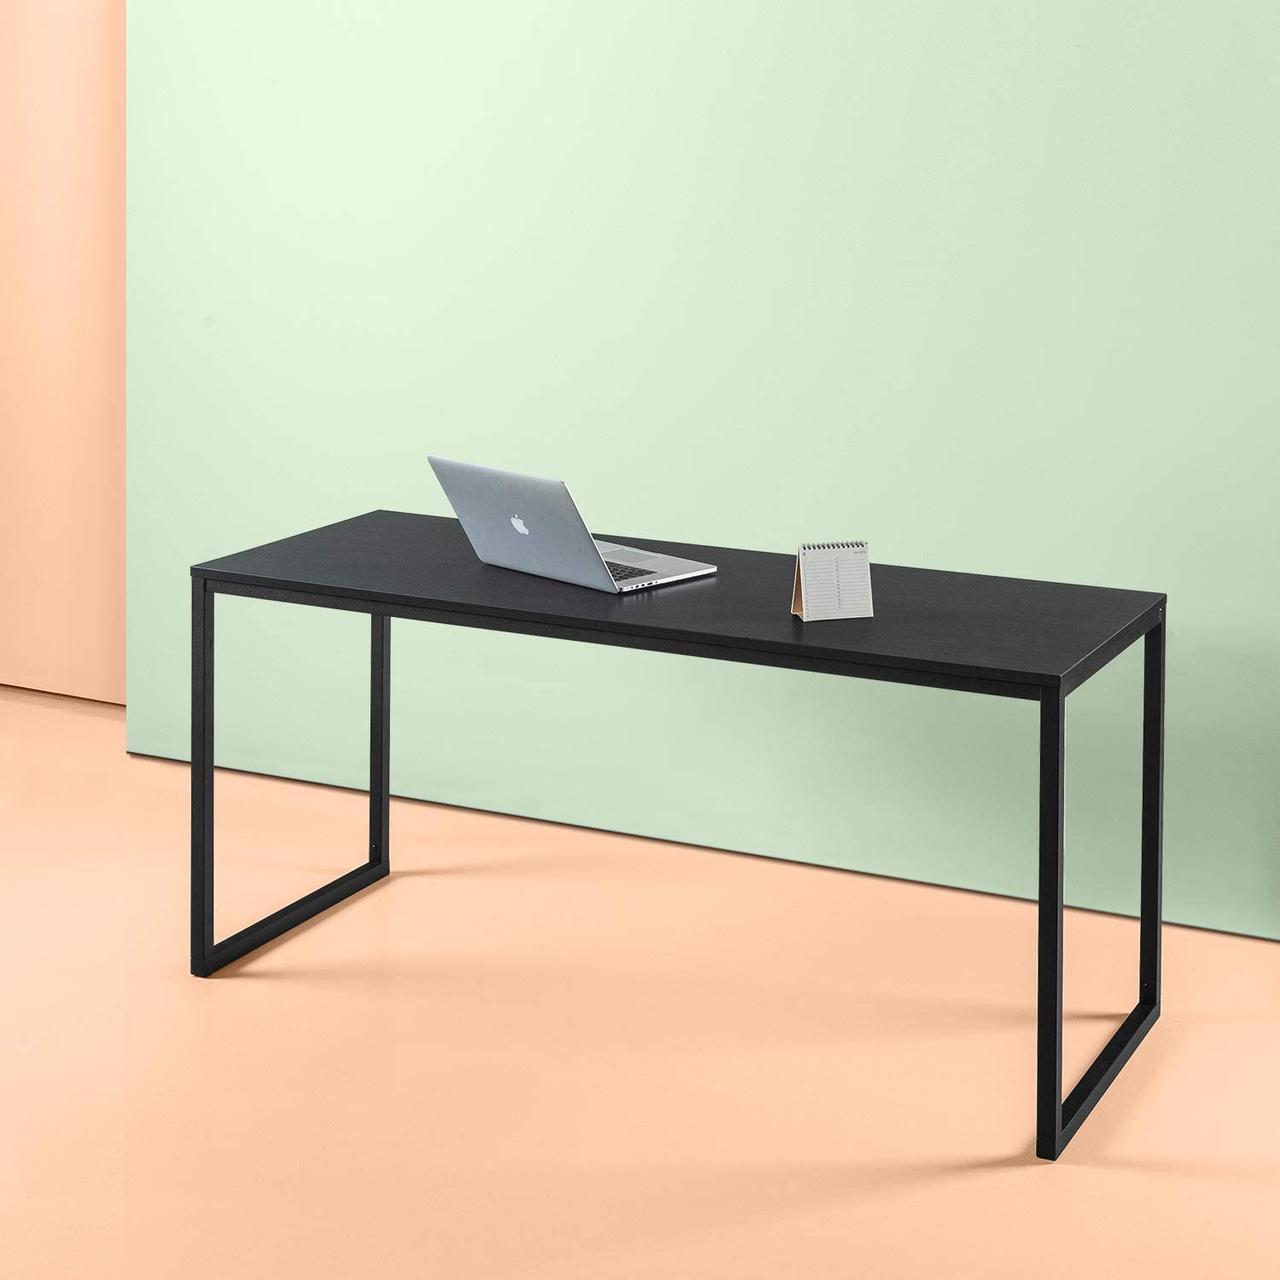 Стол письменный GoodsMetall из металла в стиле Лофт 1600х600х740 СП111